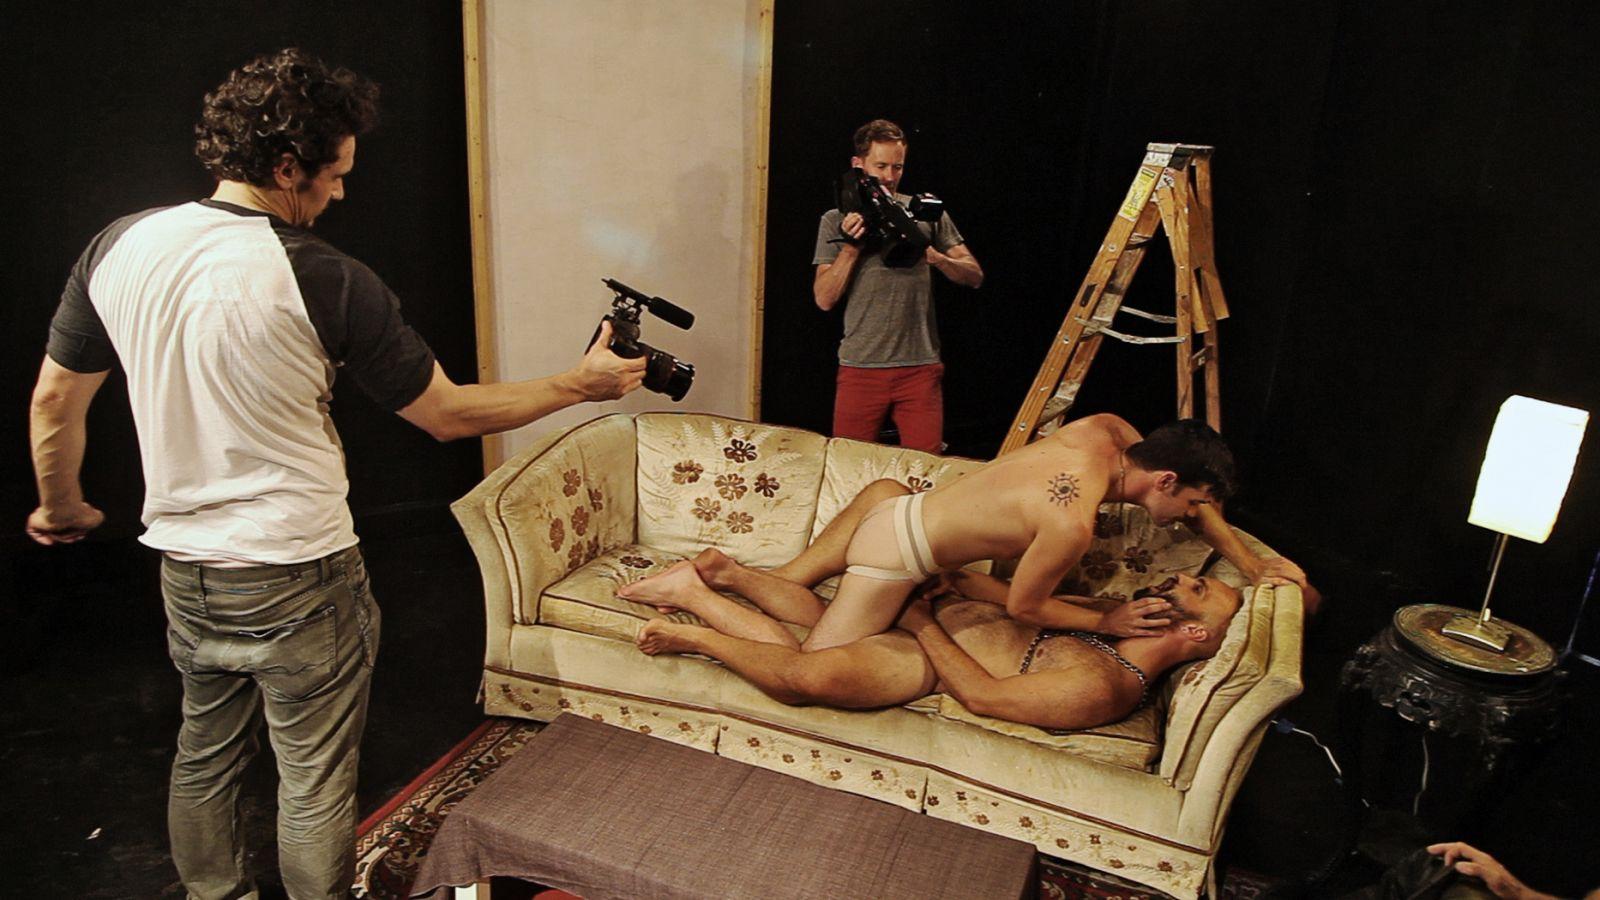 schwule pornodarsteller gangbang film